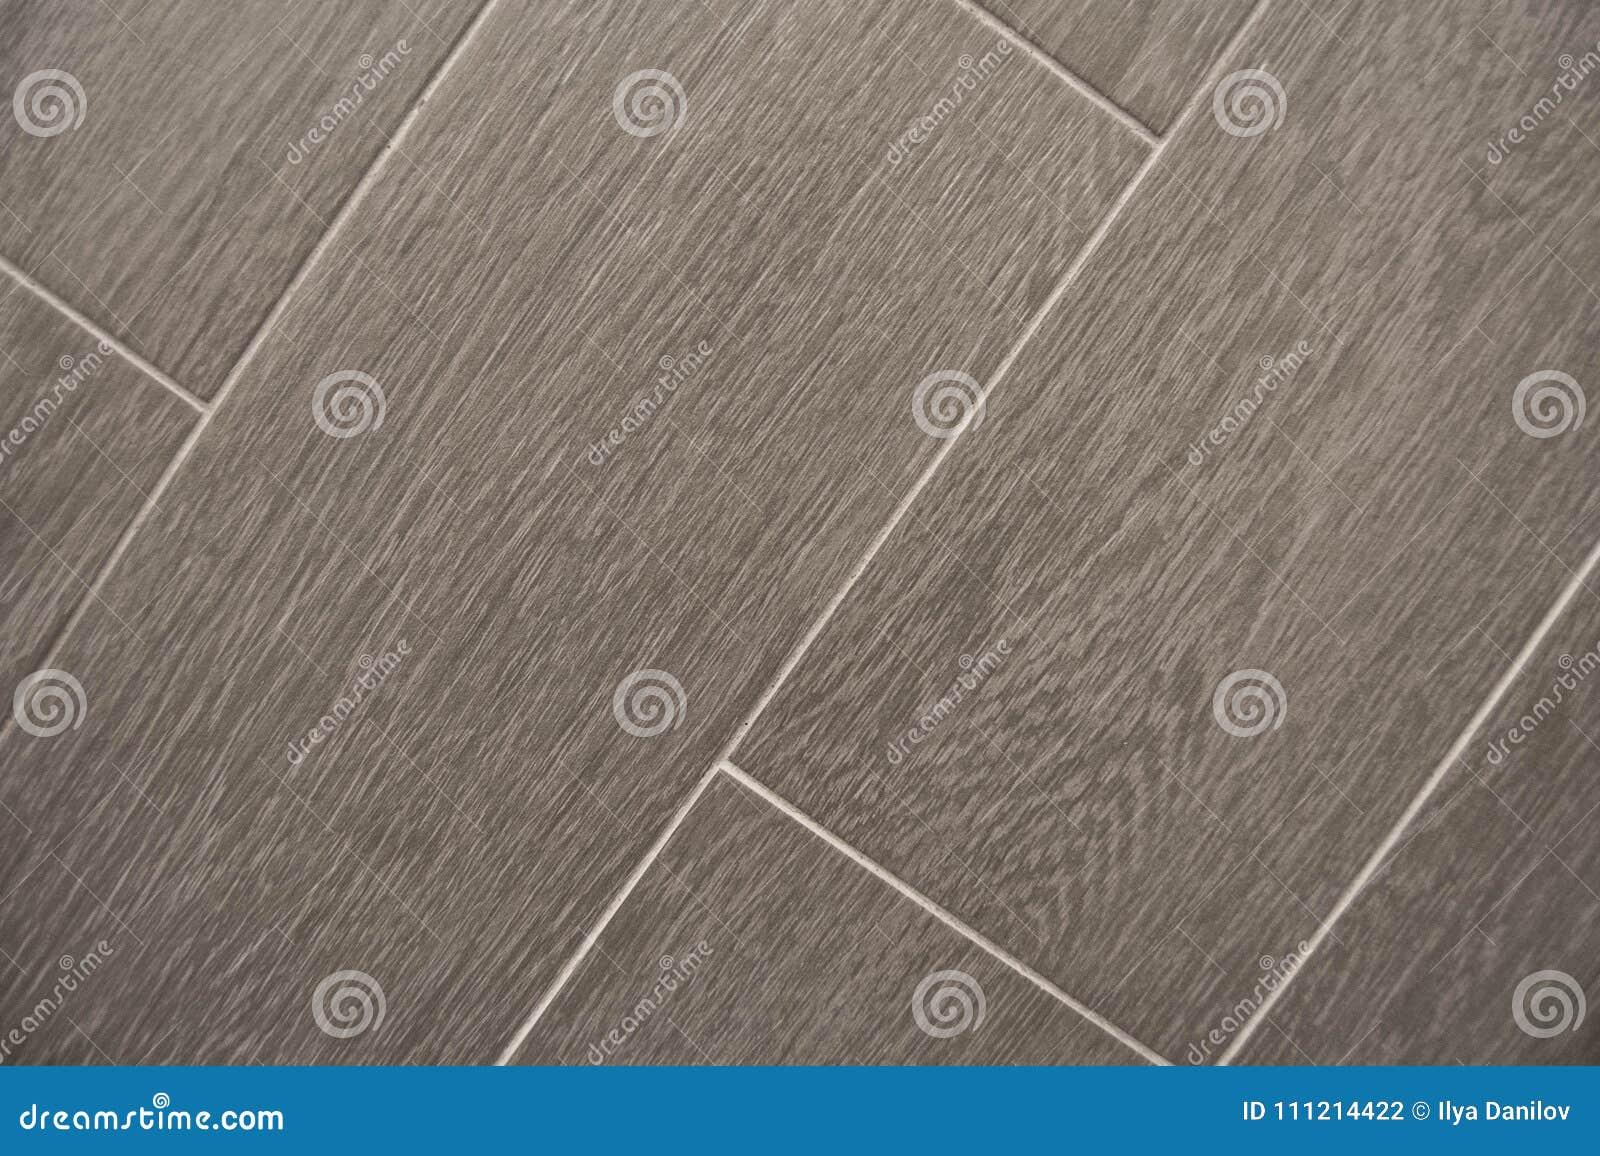 Ceramic Floor Tiles For Texture